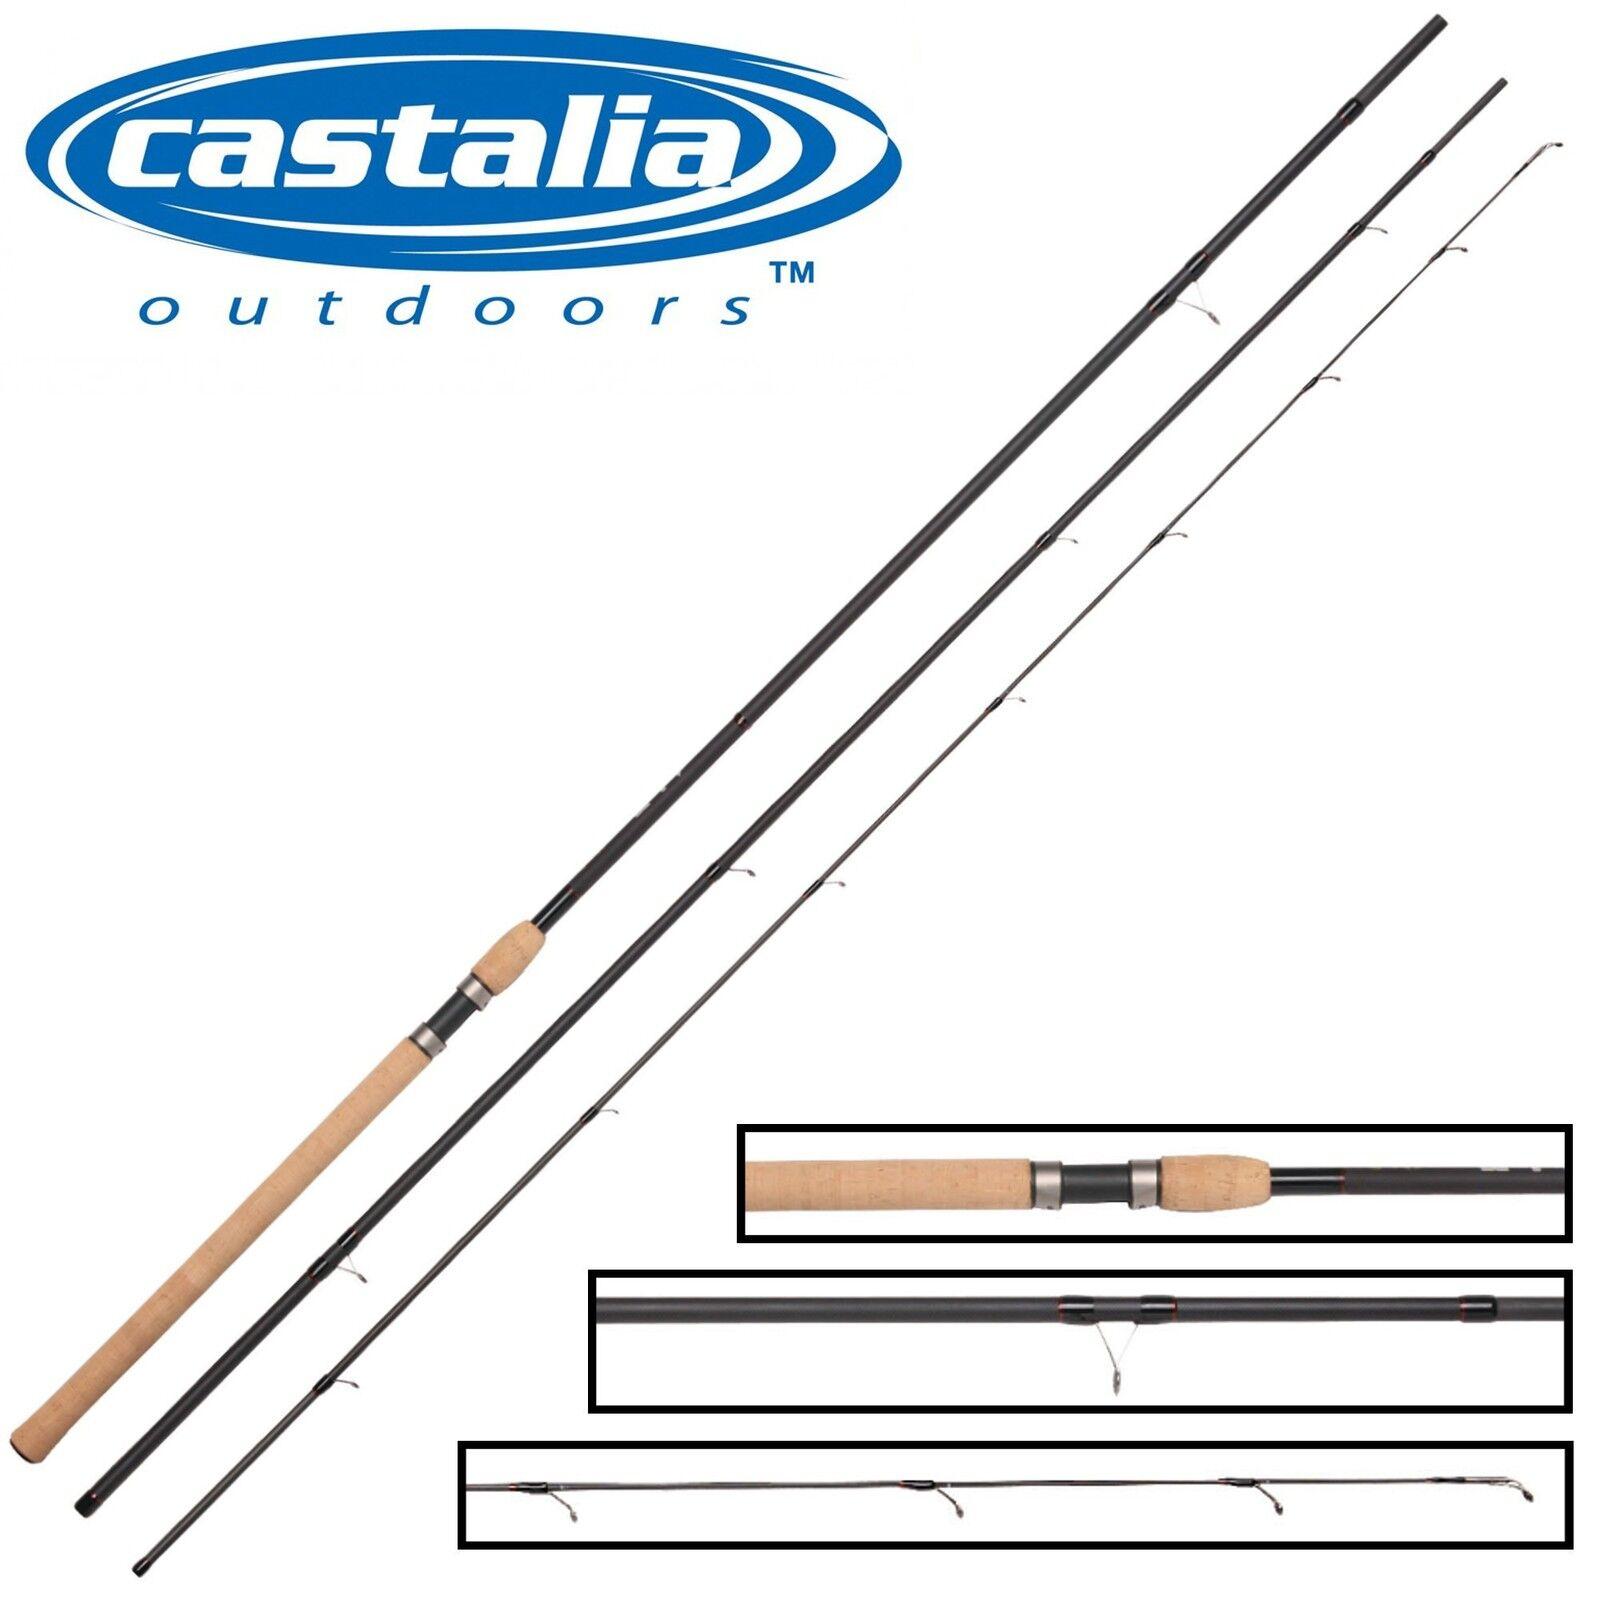 Castalia Match Pro 420cm 5-25g - Matchrute Angelrute Forellenrute